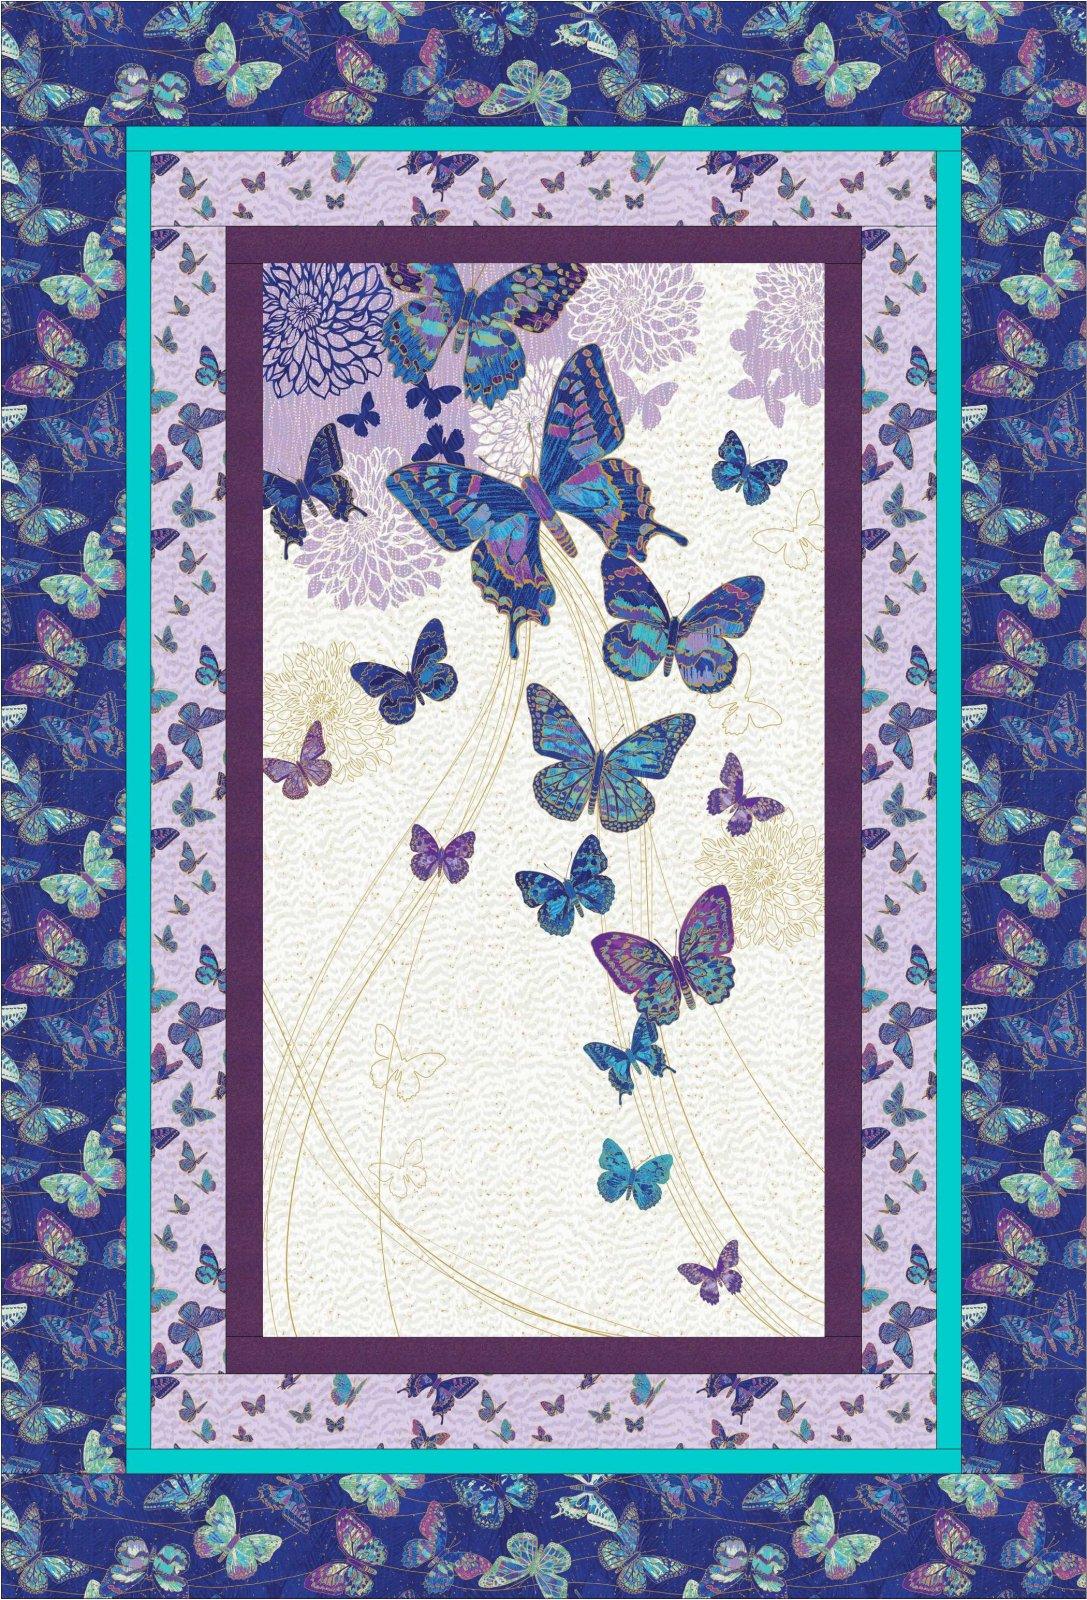 Fantasia Butterfly Kit